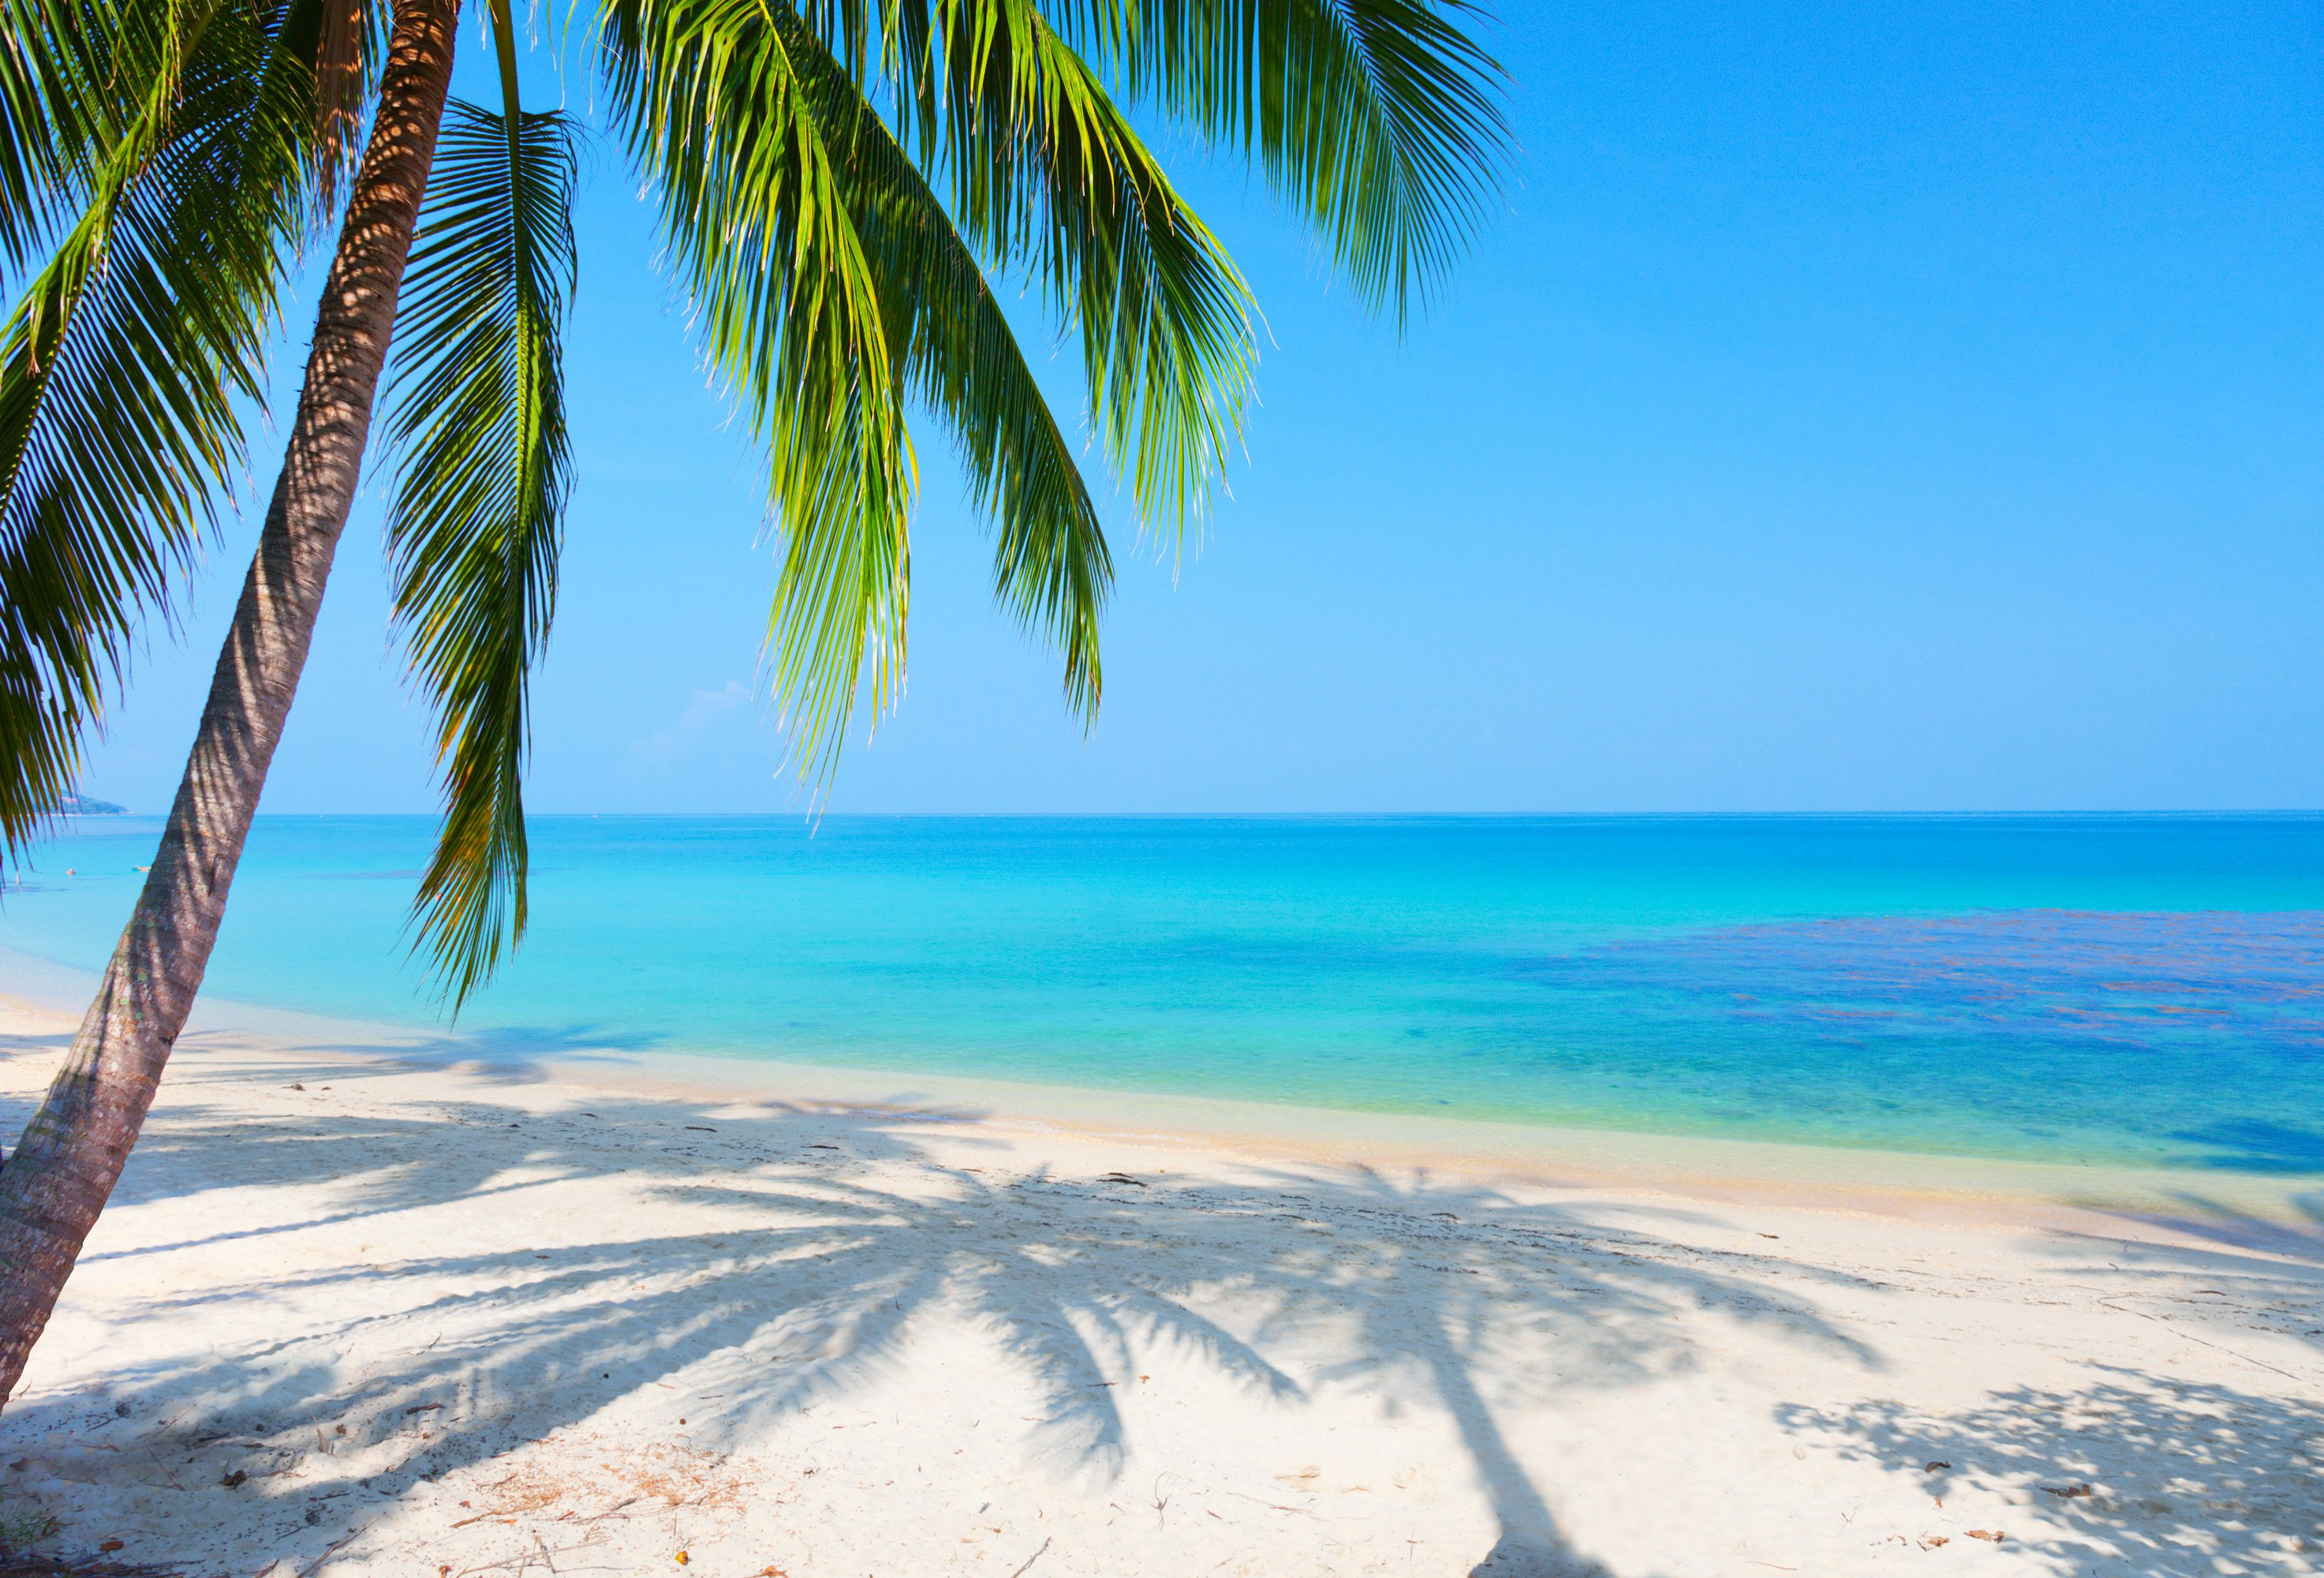 Beach Reflection Landscape Palm Tree Sea Wallpaper